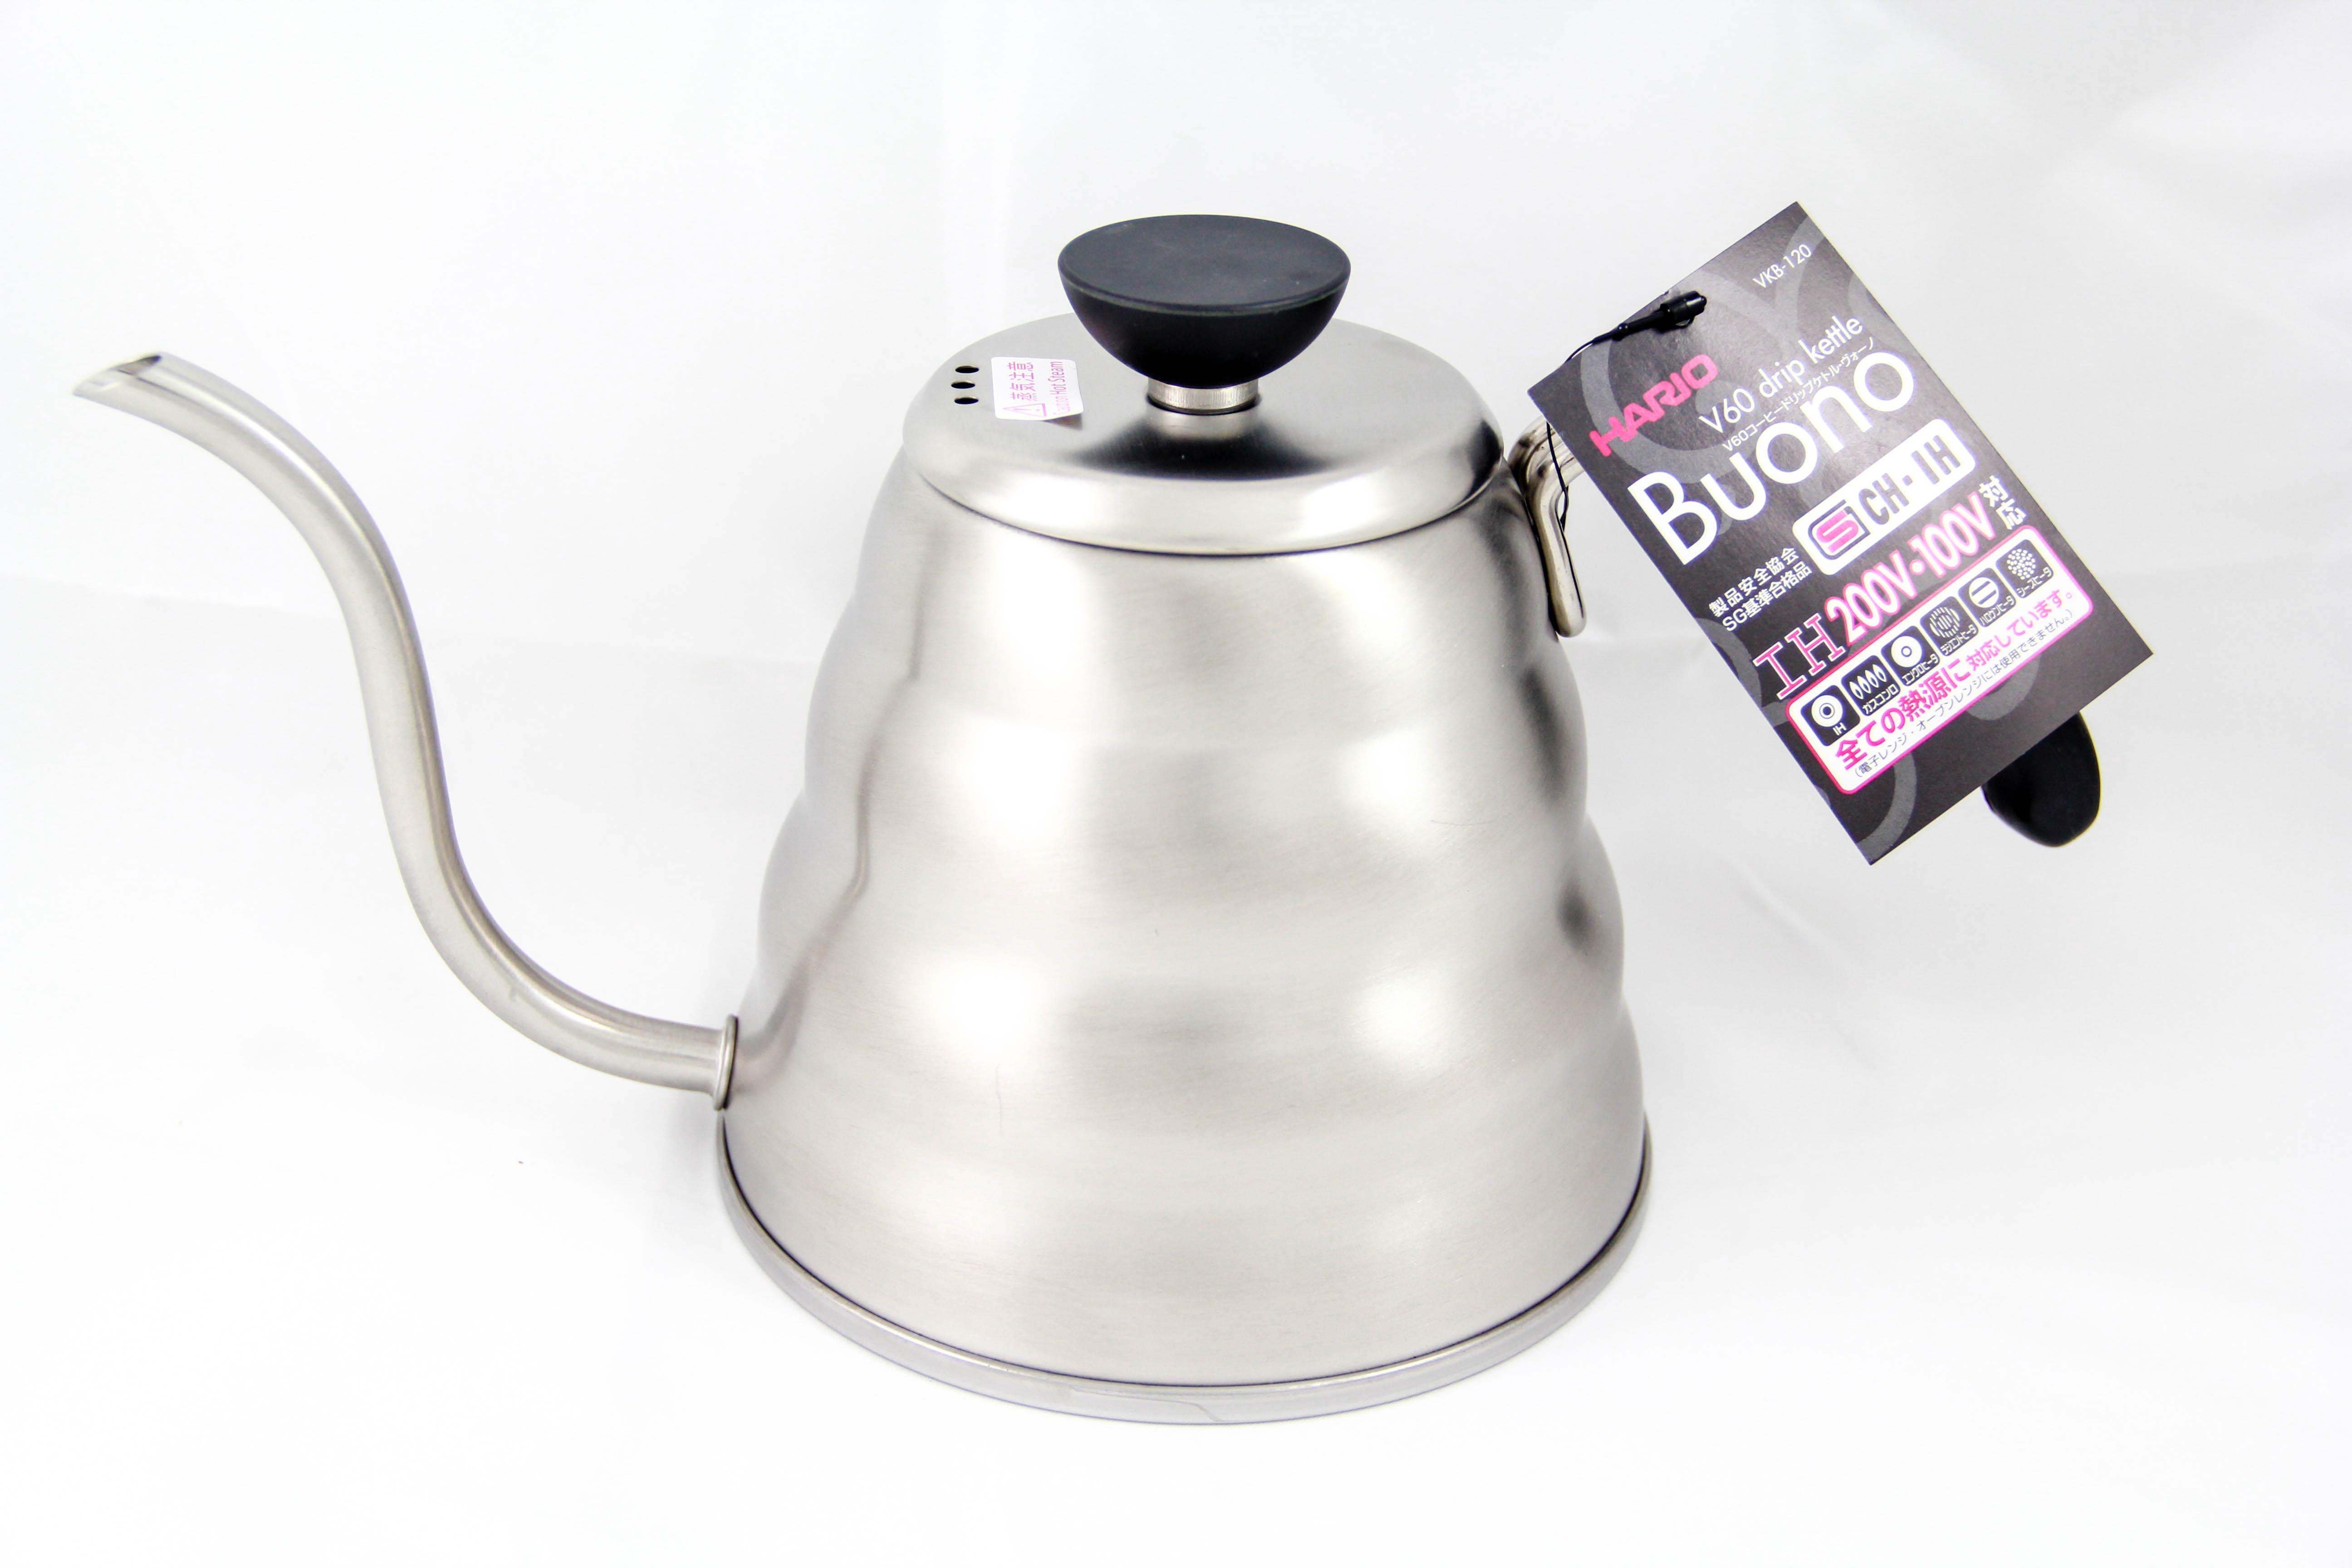 V60 120 Coffee drip Kettle 'Bruno'